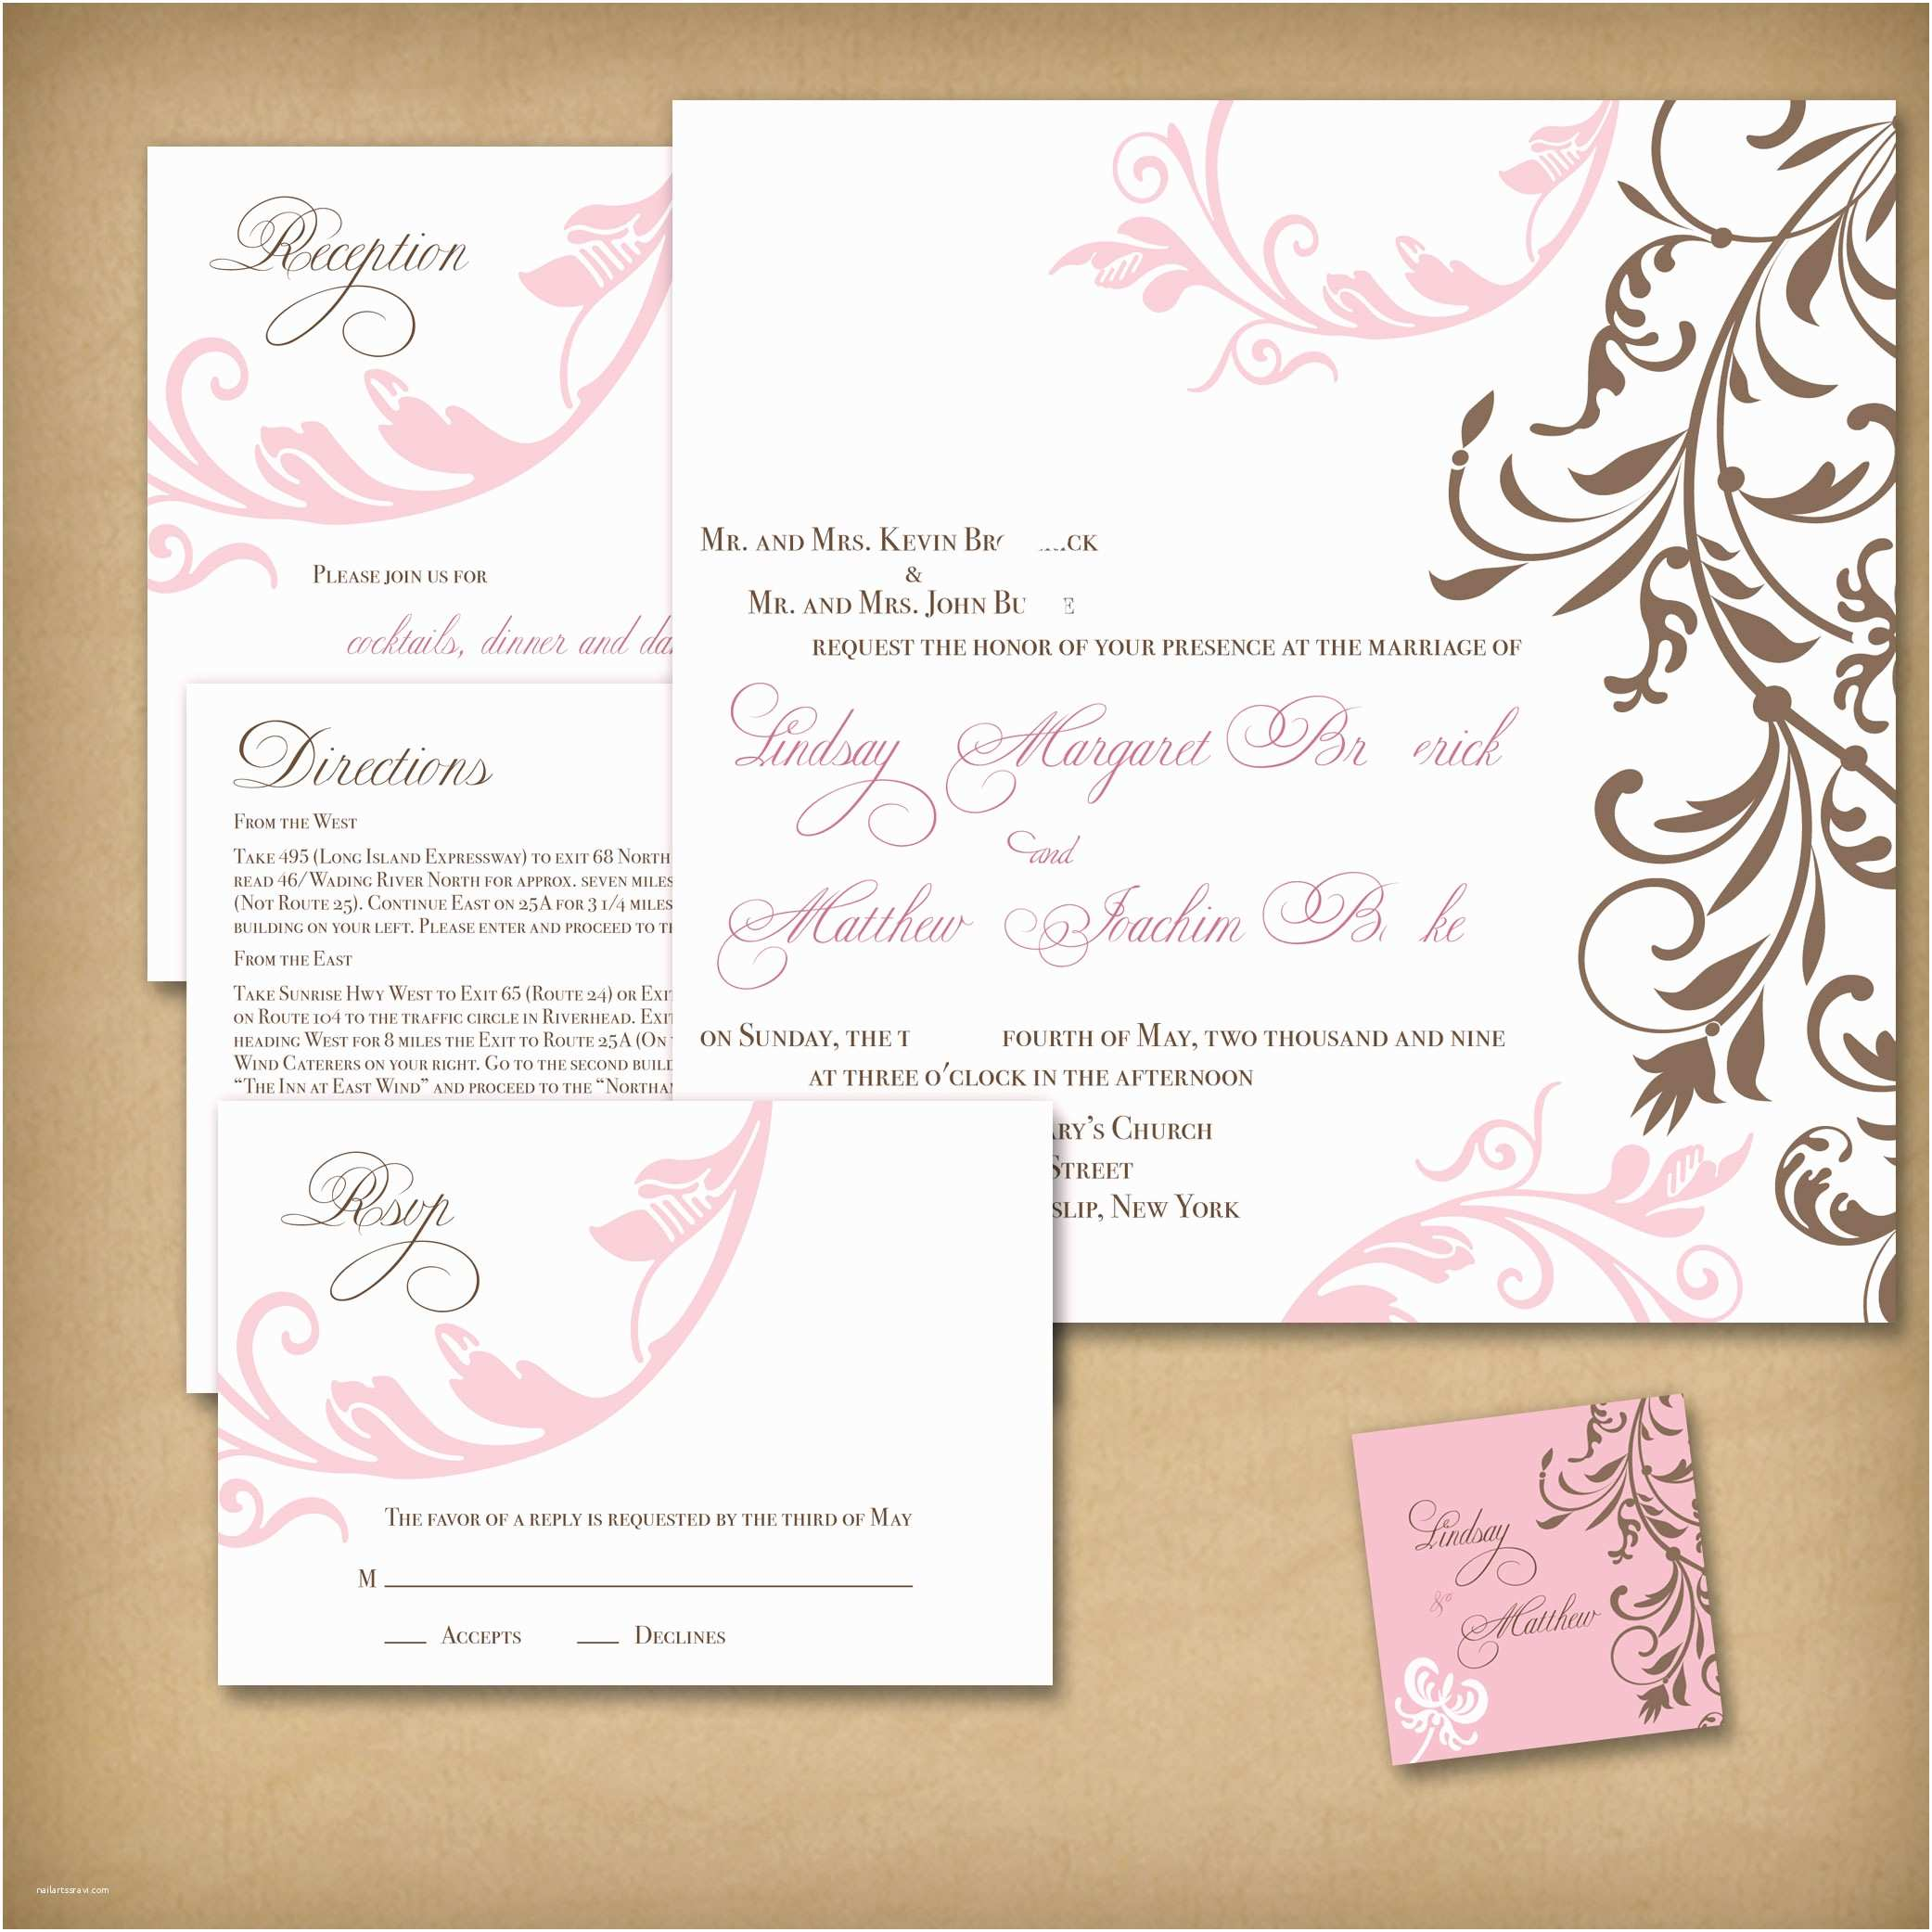 Wedding Invitation Samples Free Templates Wedding Invitation Wording Wedding Invitation Cards